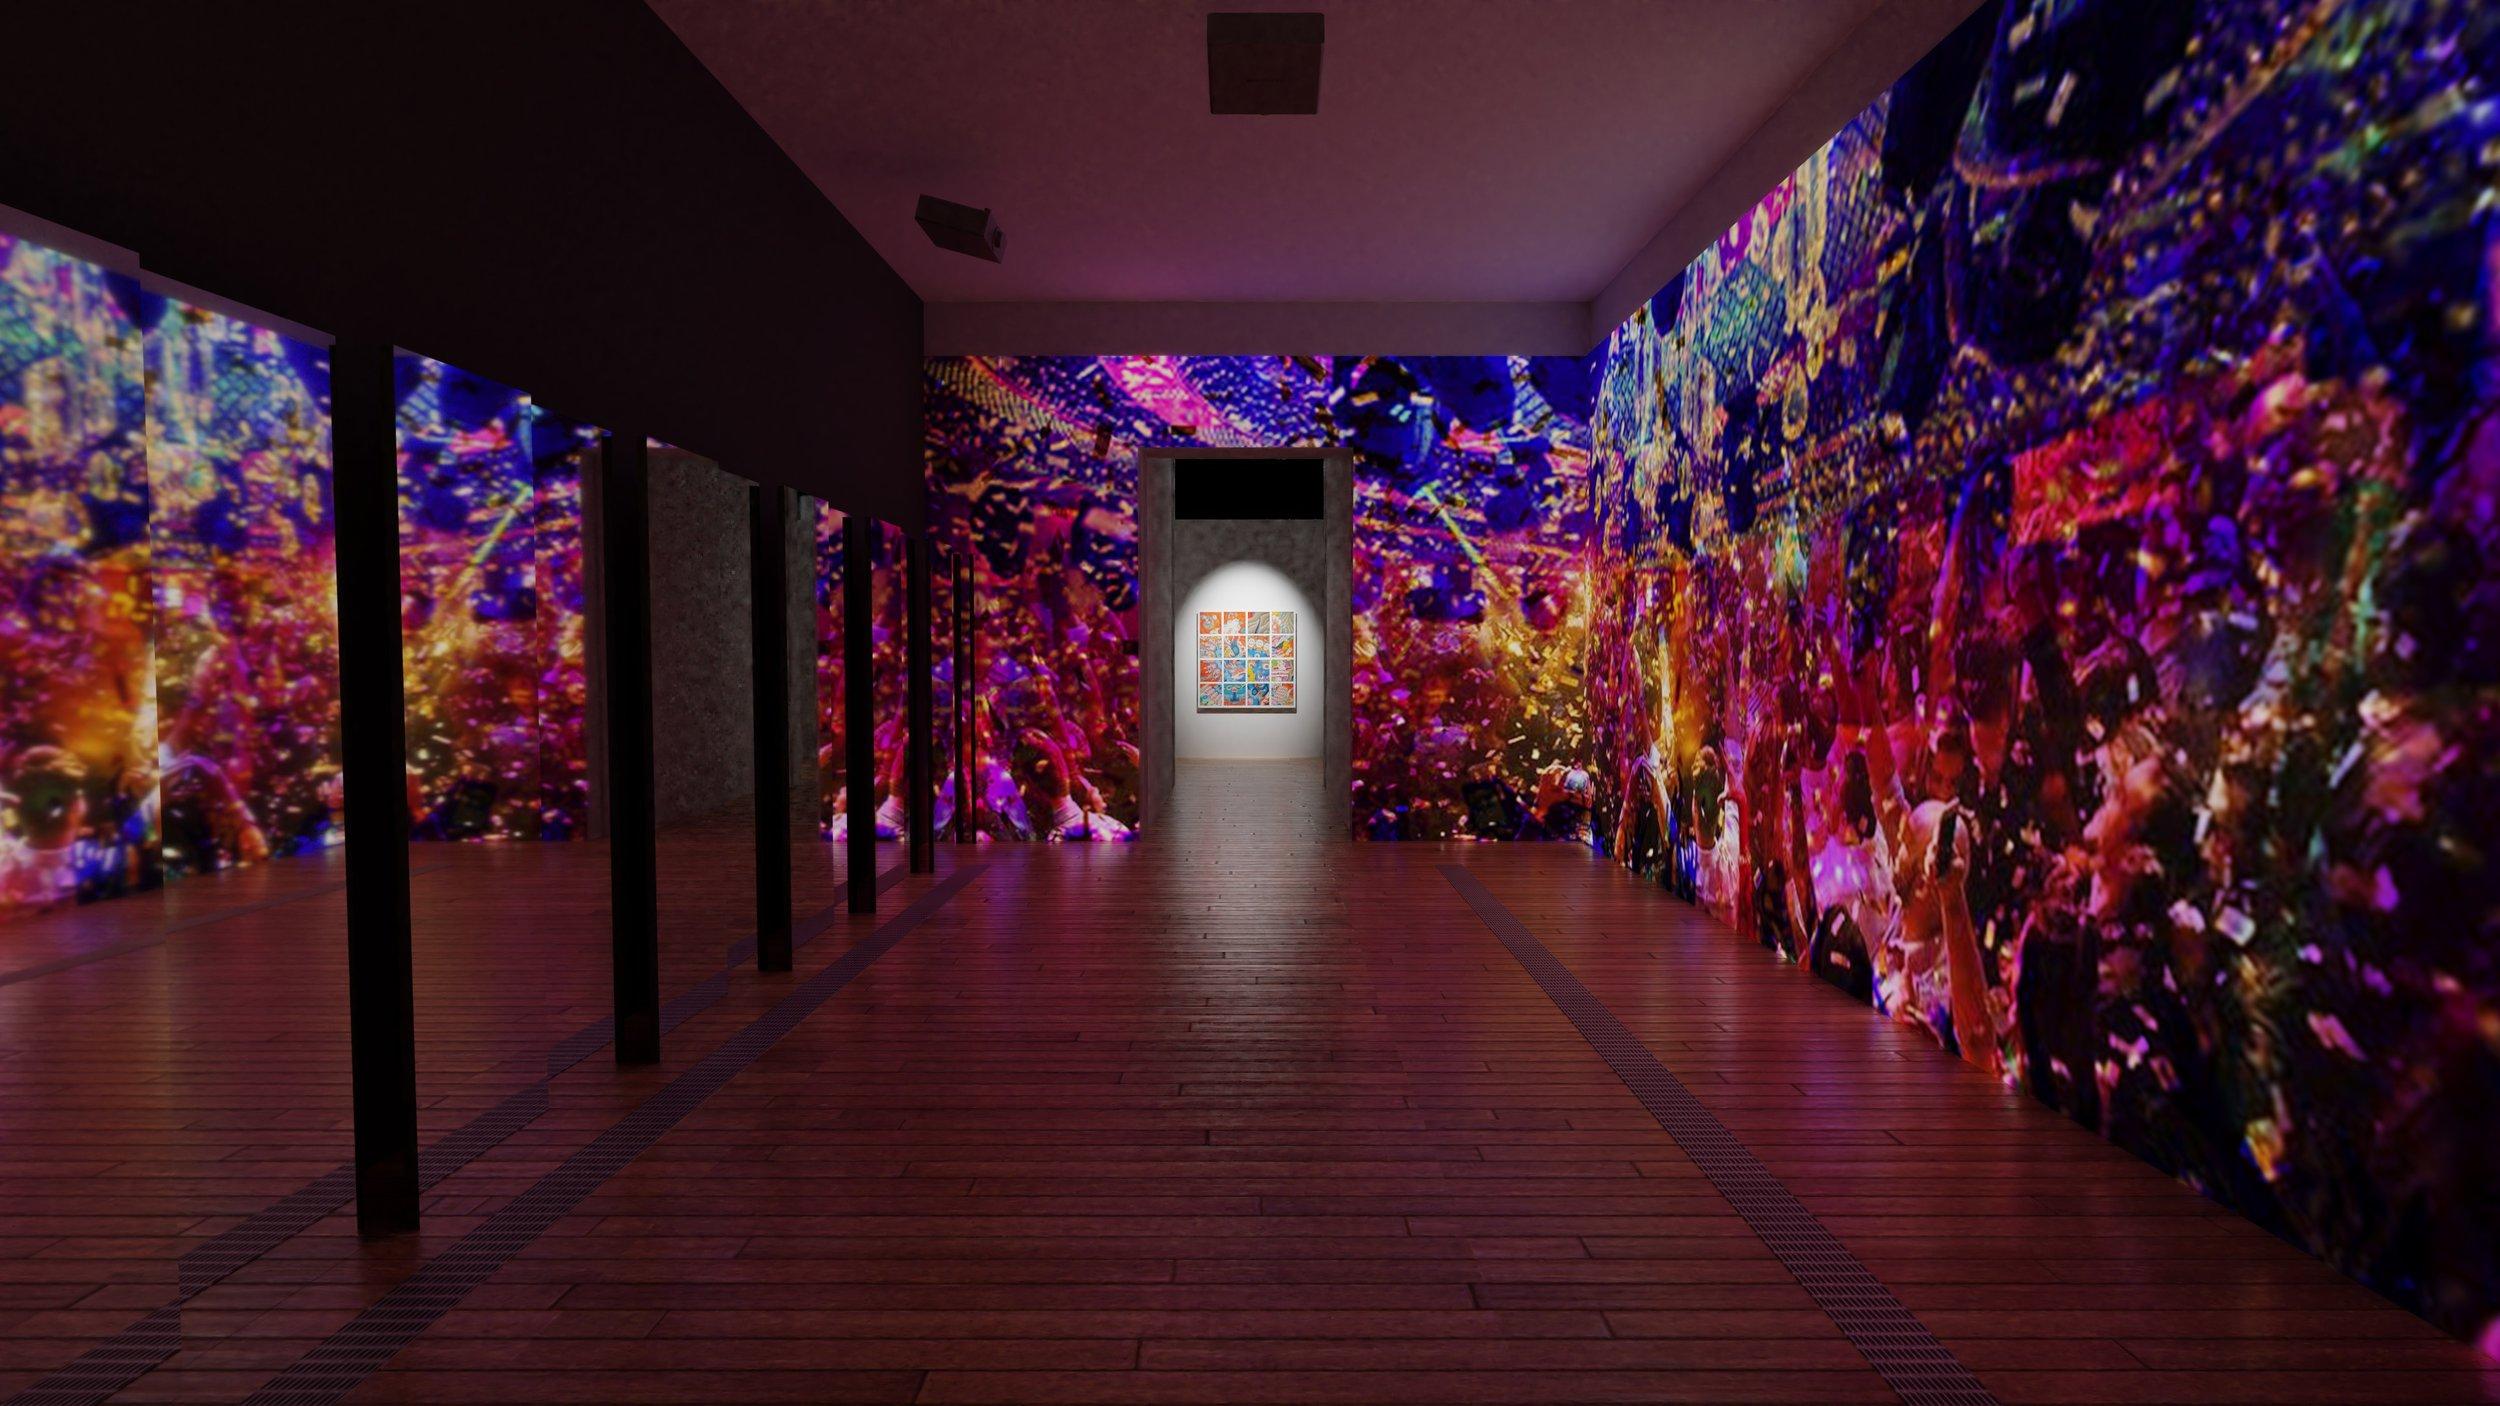 Mirror_3PJ_Entrance Walls_Collage.jpg